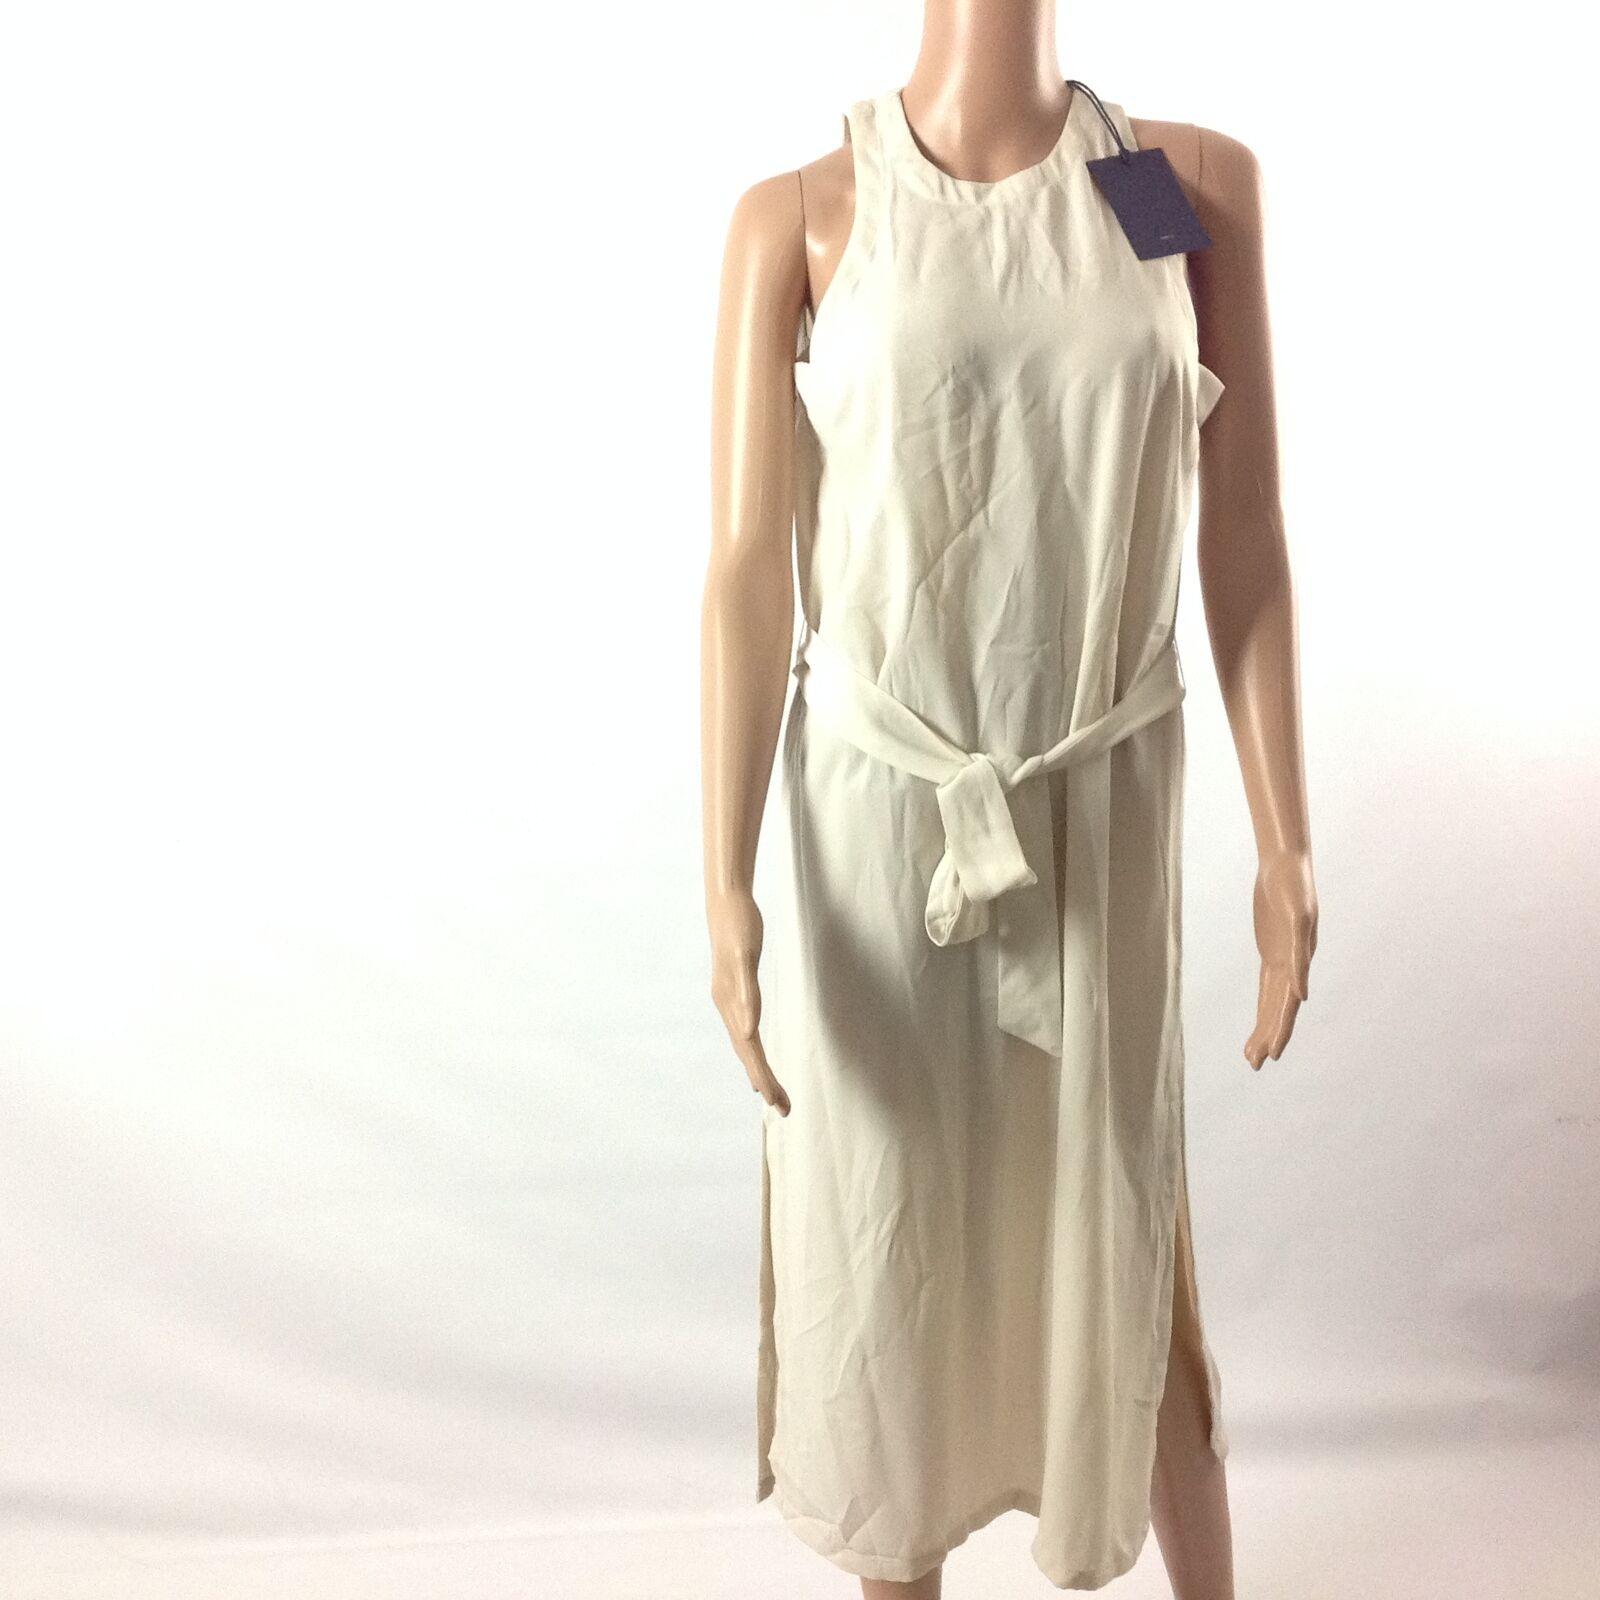 Stelen F35 Womens Semi Sheer Dress Sleeveless Belted Side Slits Beige Size S NWT